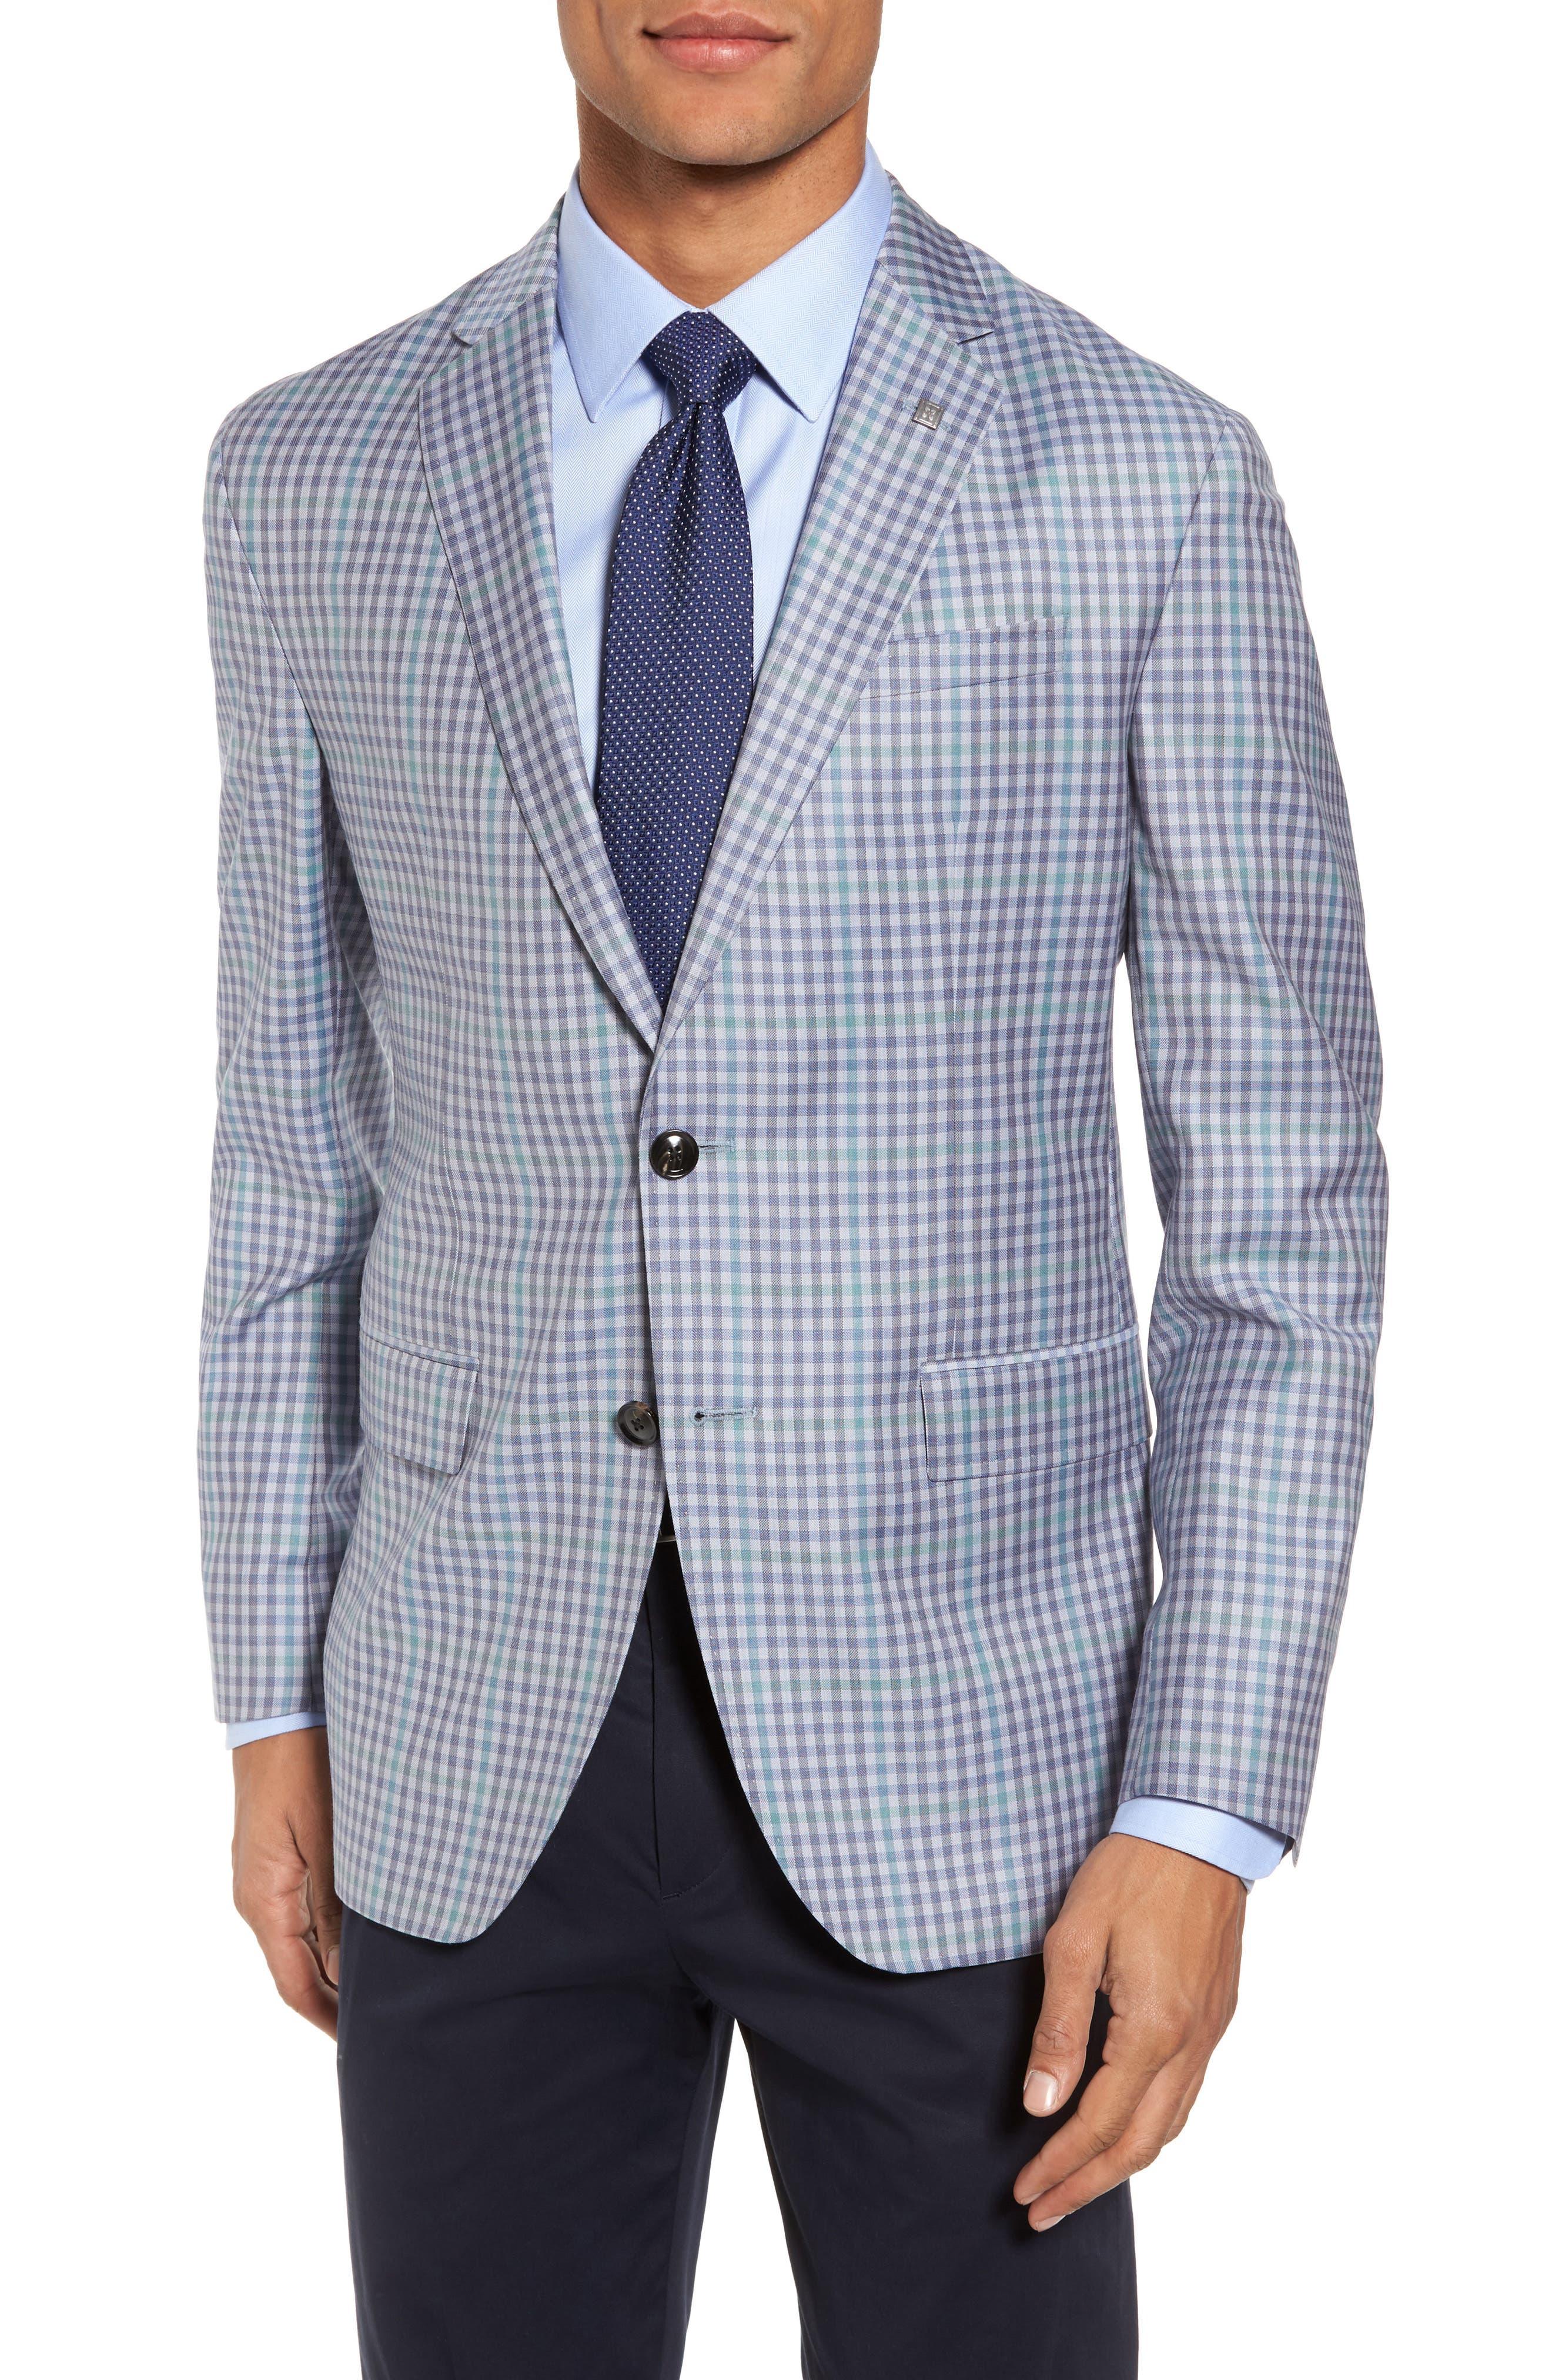 Konan Trim Fit Check Wool Sport Coat,                             Main thumbnail 1, color,                             Blue Grey Green Ck